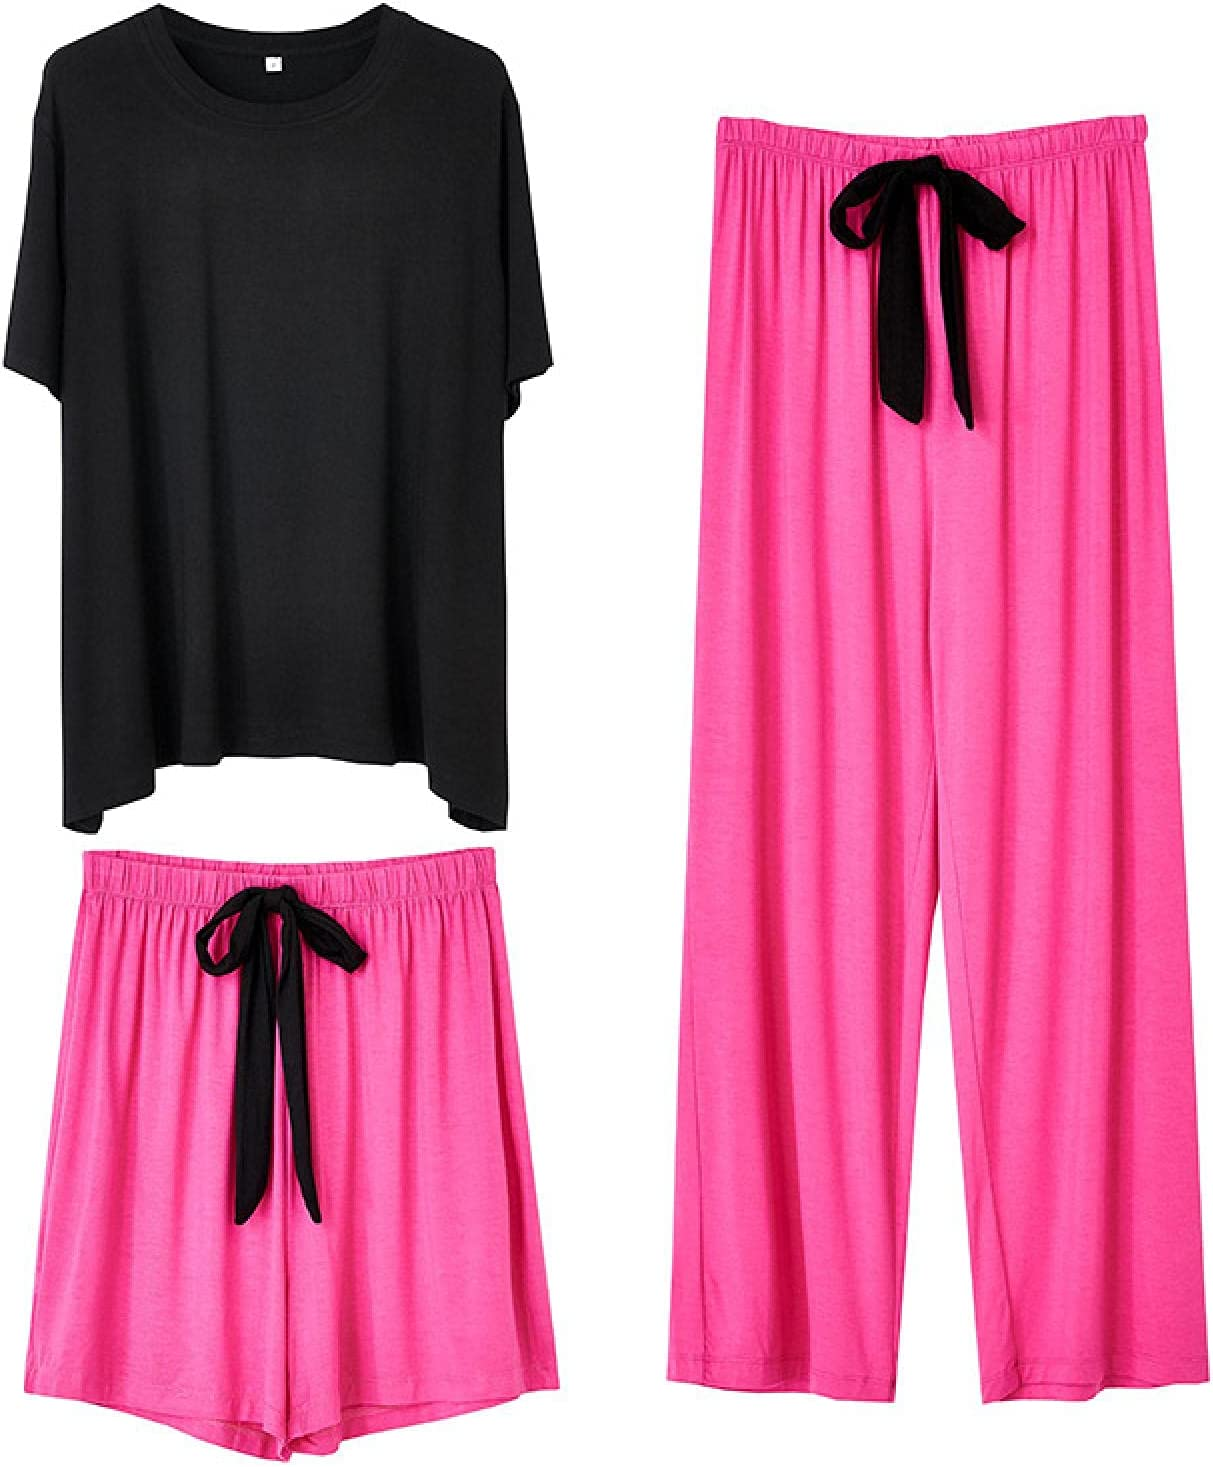 STJDM Nightgown,Modal Pajamas Set Women Short Homewear Summer Co